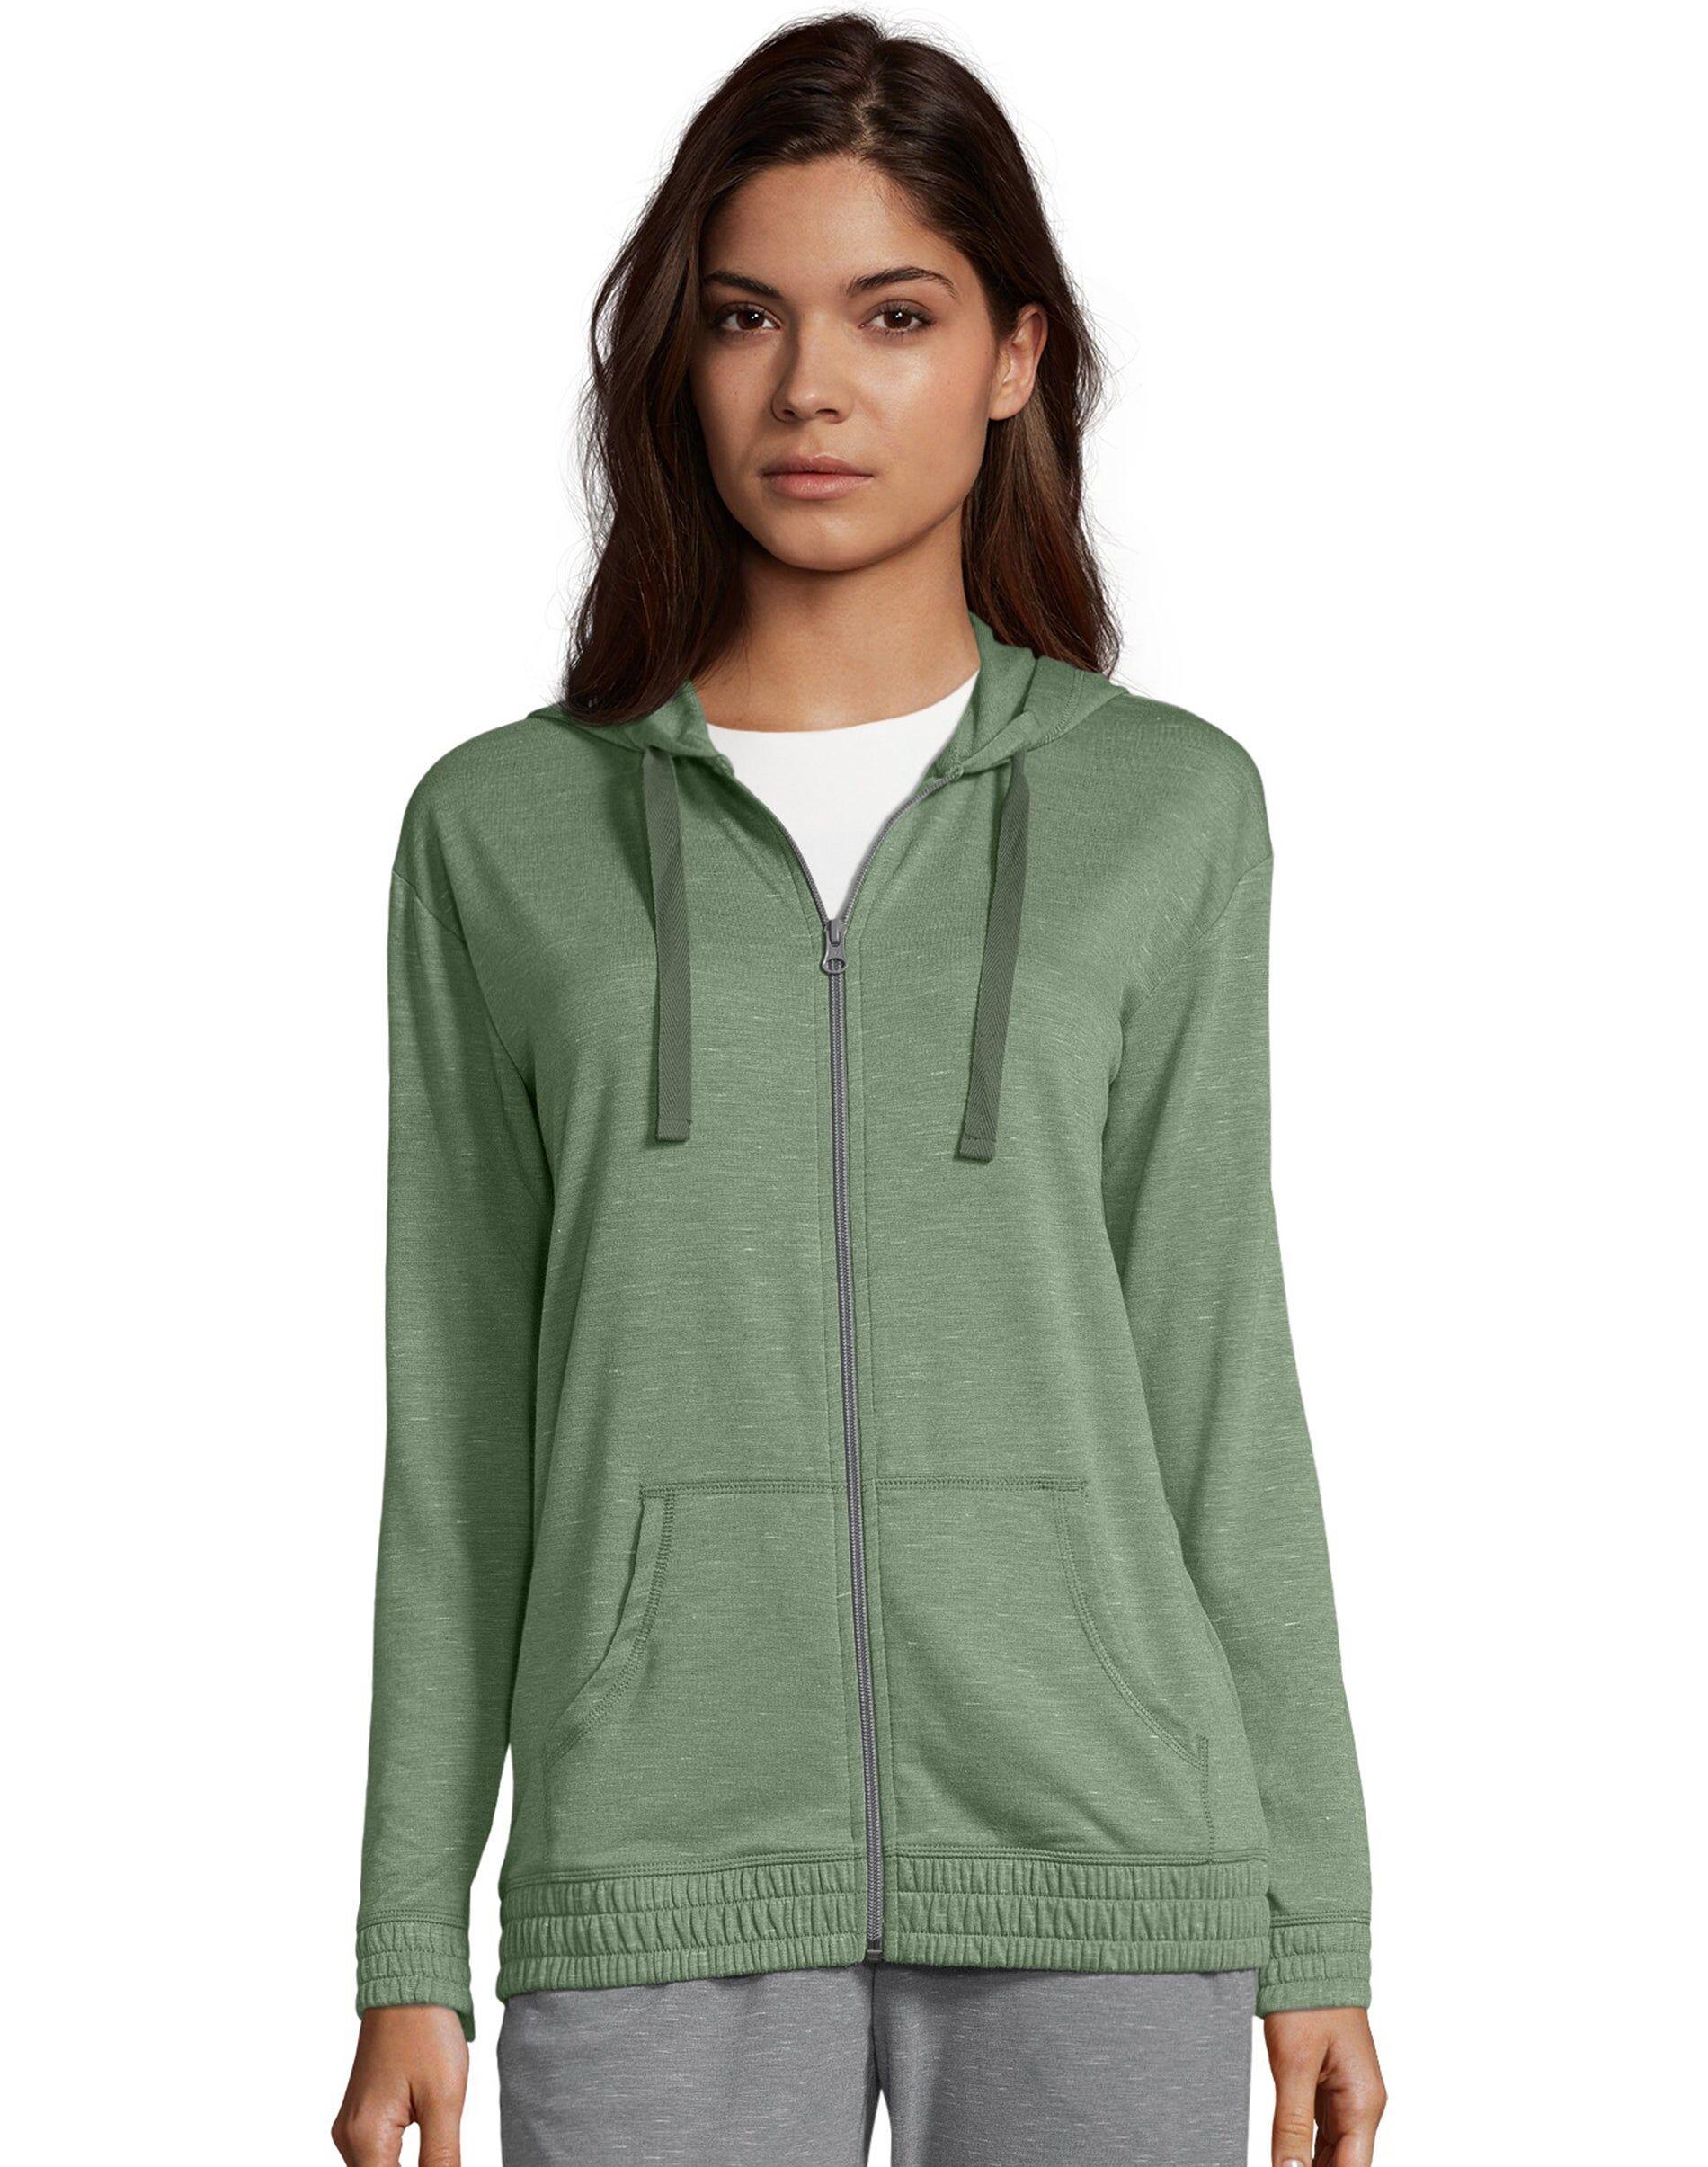 Hanes Women's French Terry Full Zip Hoodie Nature Green Heather S